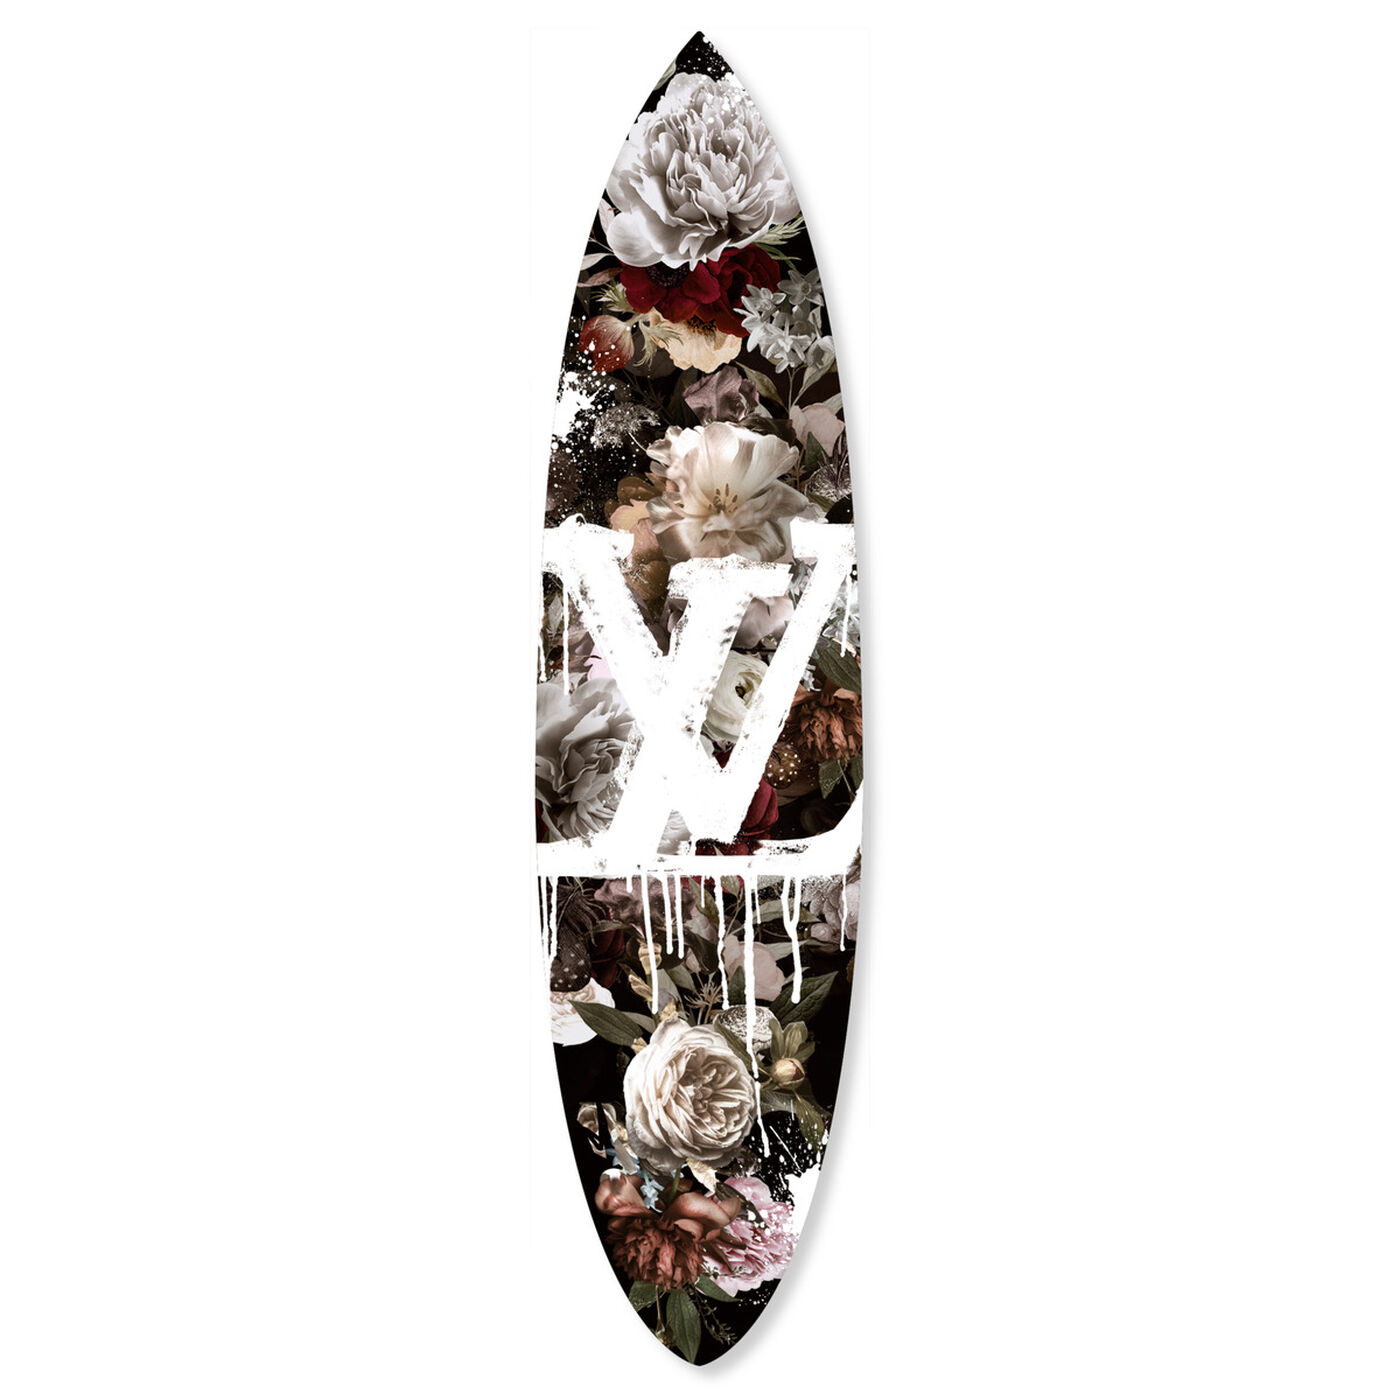 King Bloom Surfboard